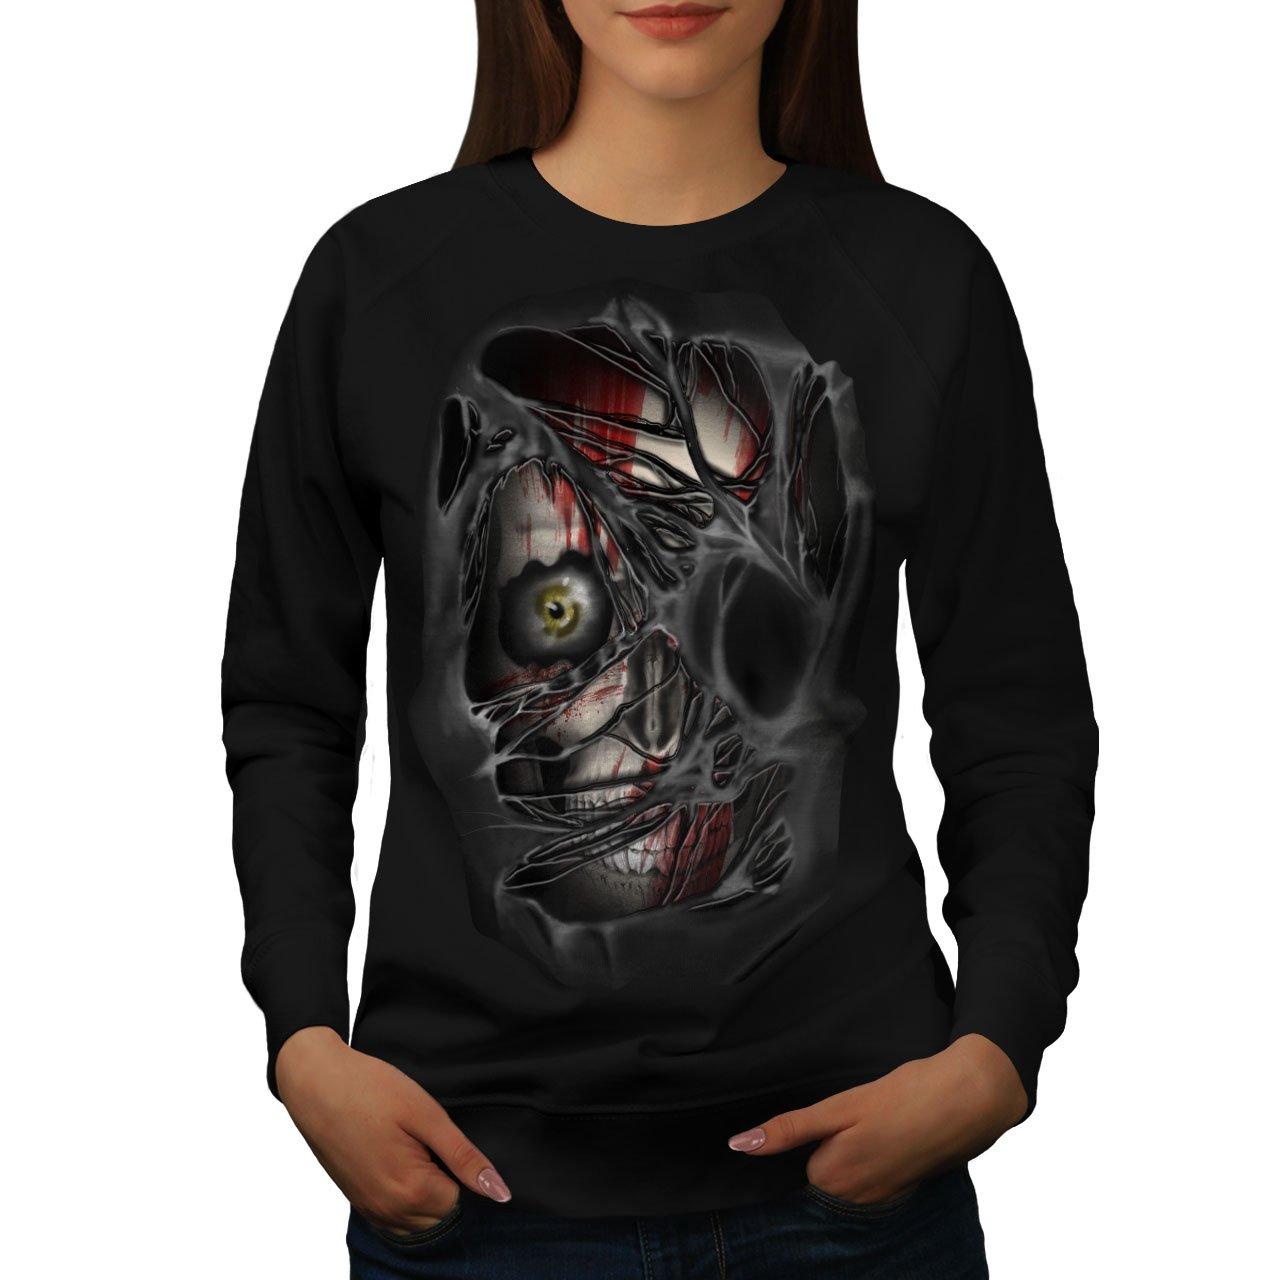 Wellcoda Eye Skeleton Rock Skull Womens Sweatshirt, Torn Print Pullover Jumper